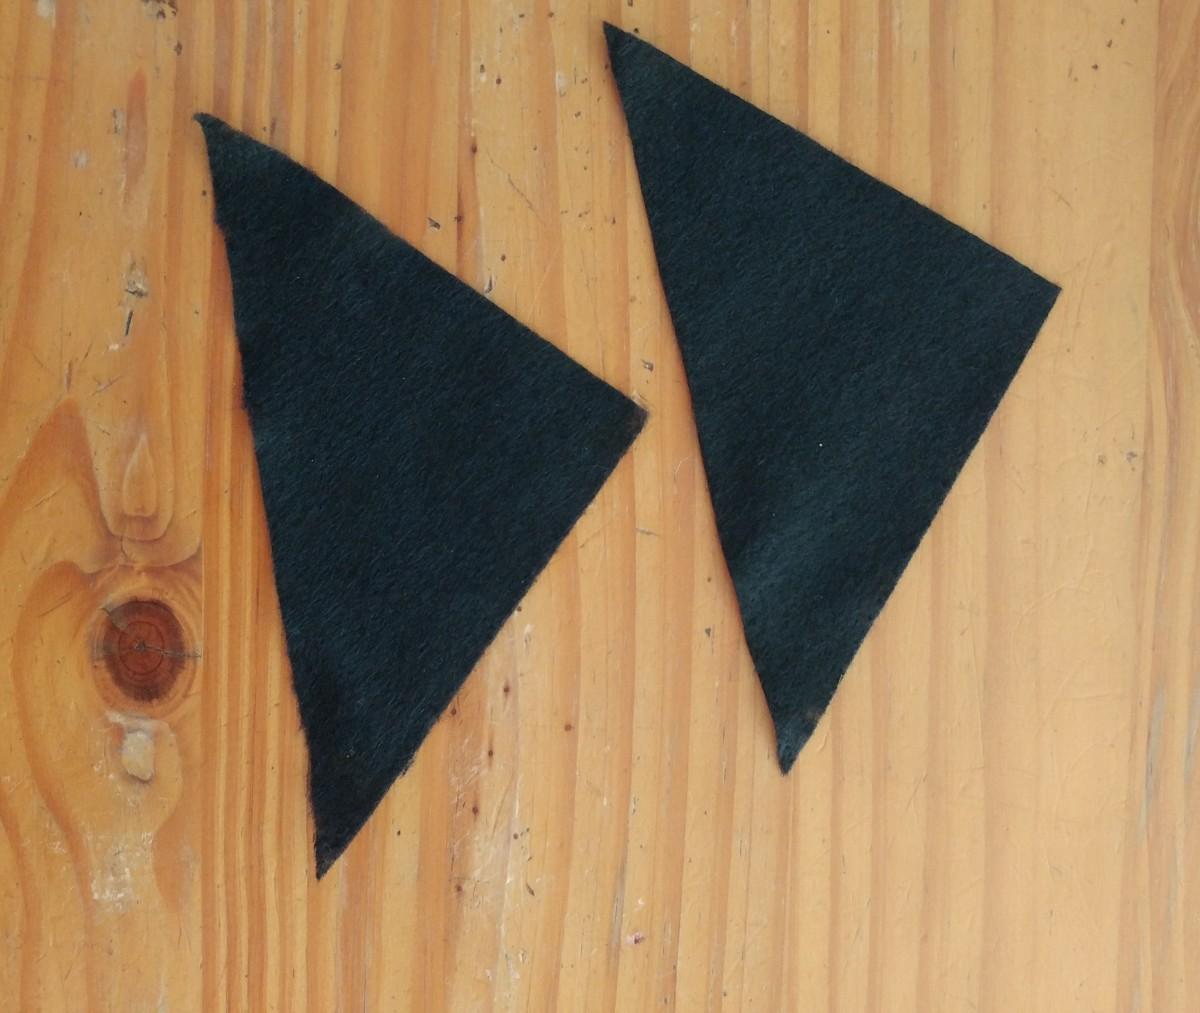 Cut black felt in shape of triangles.